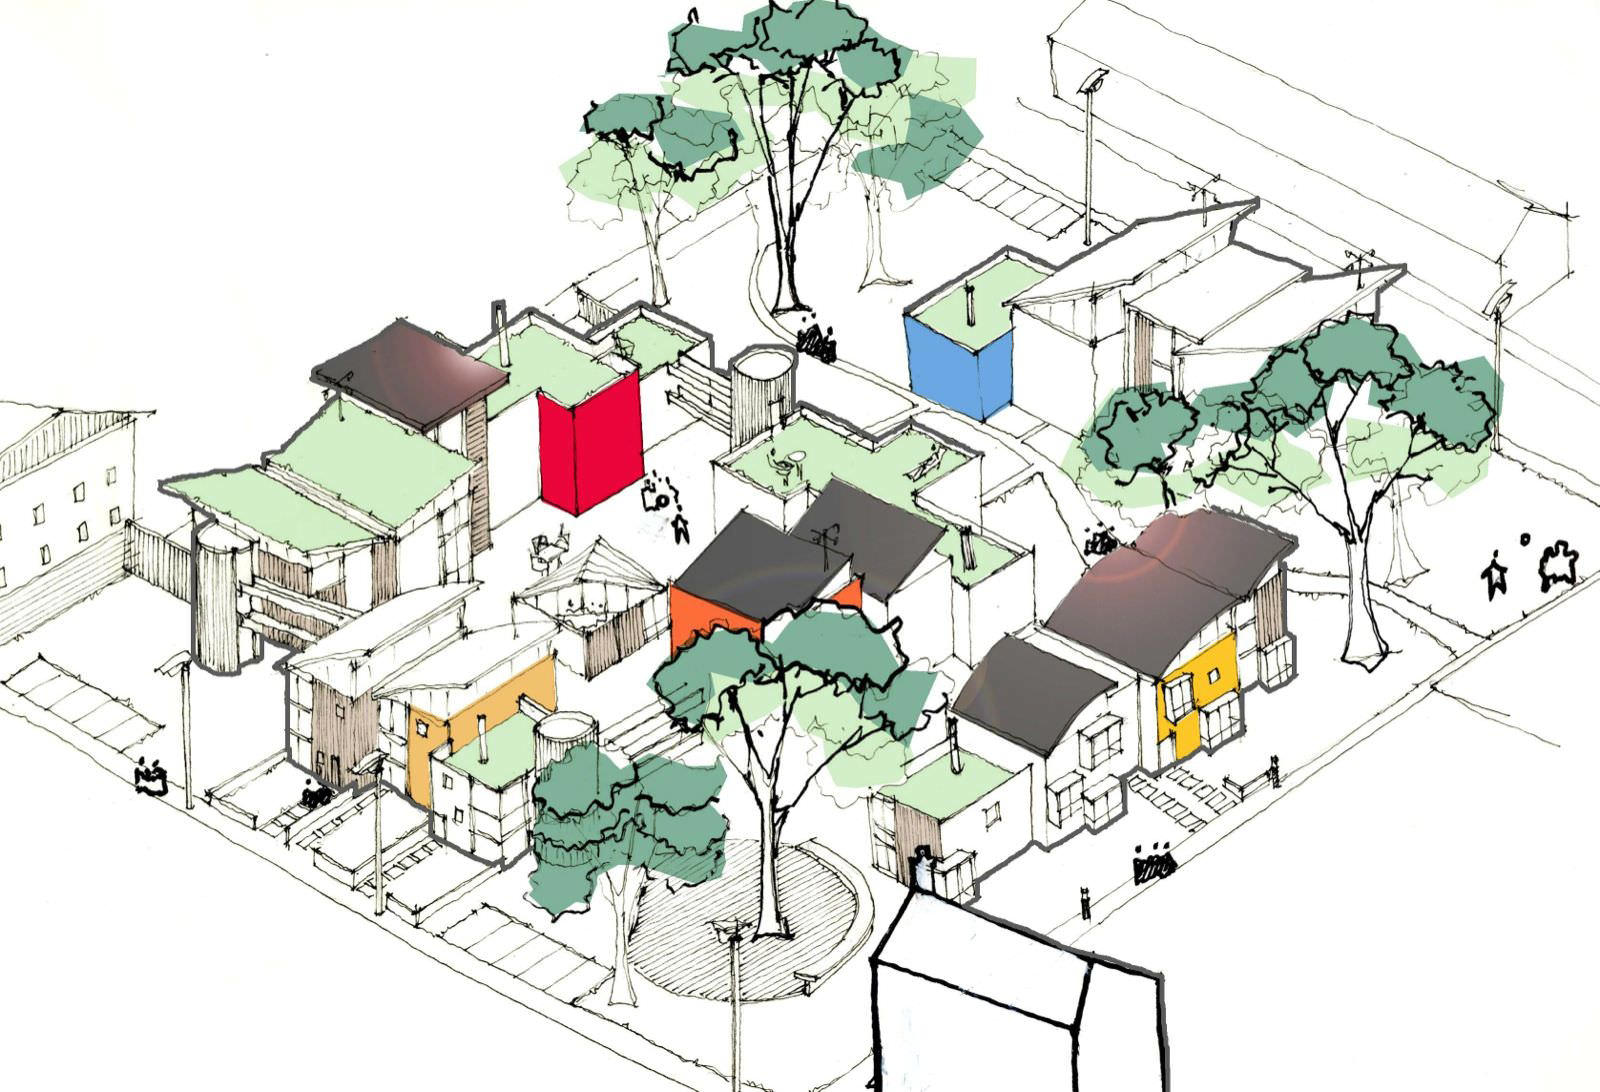 Cohousing, vir: www.nclurbandesign.org